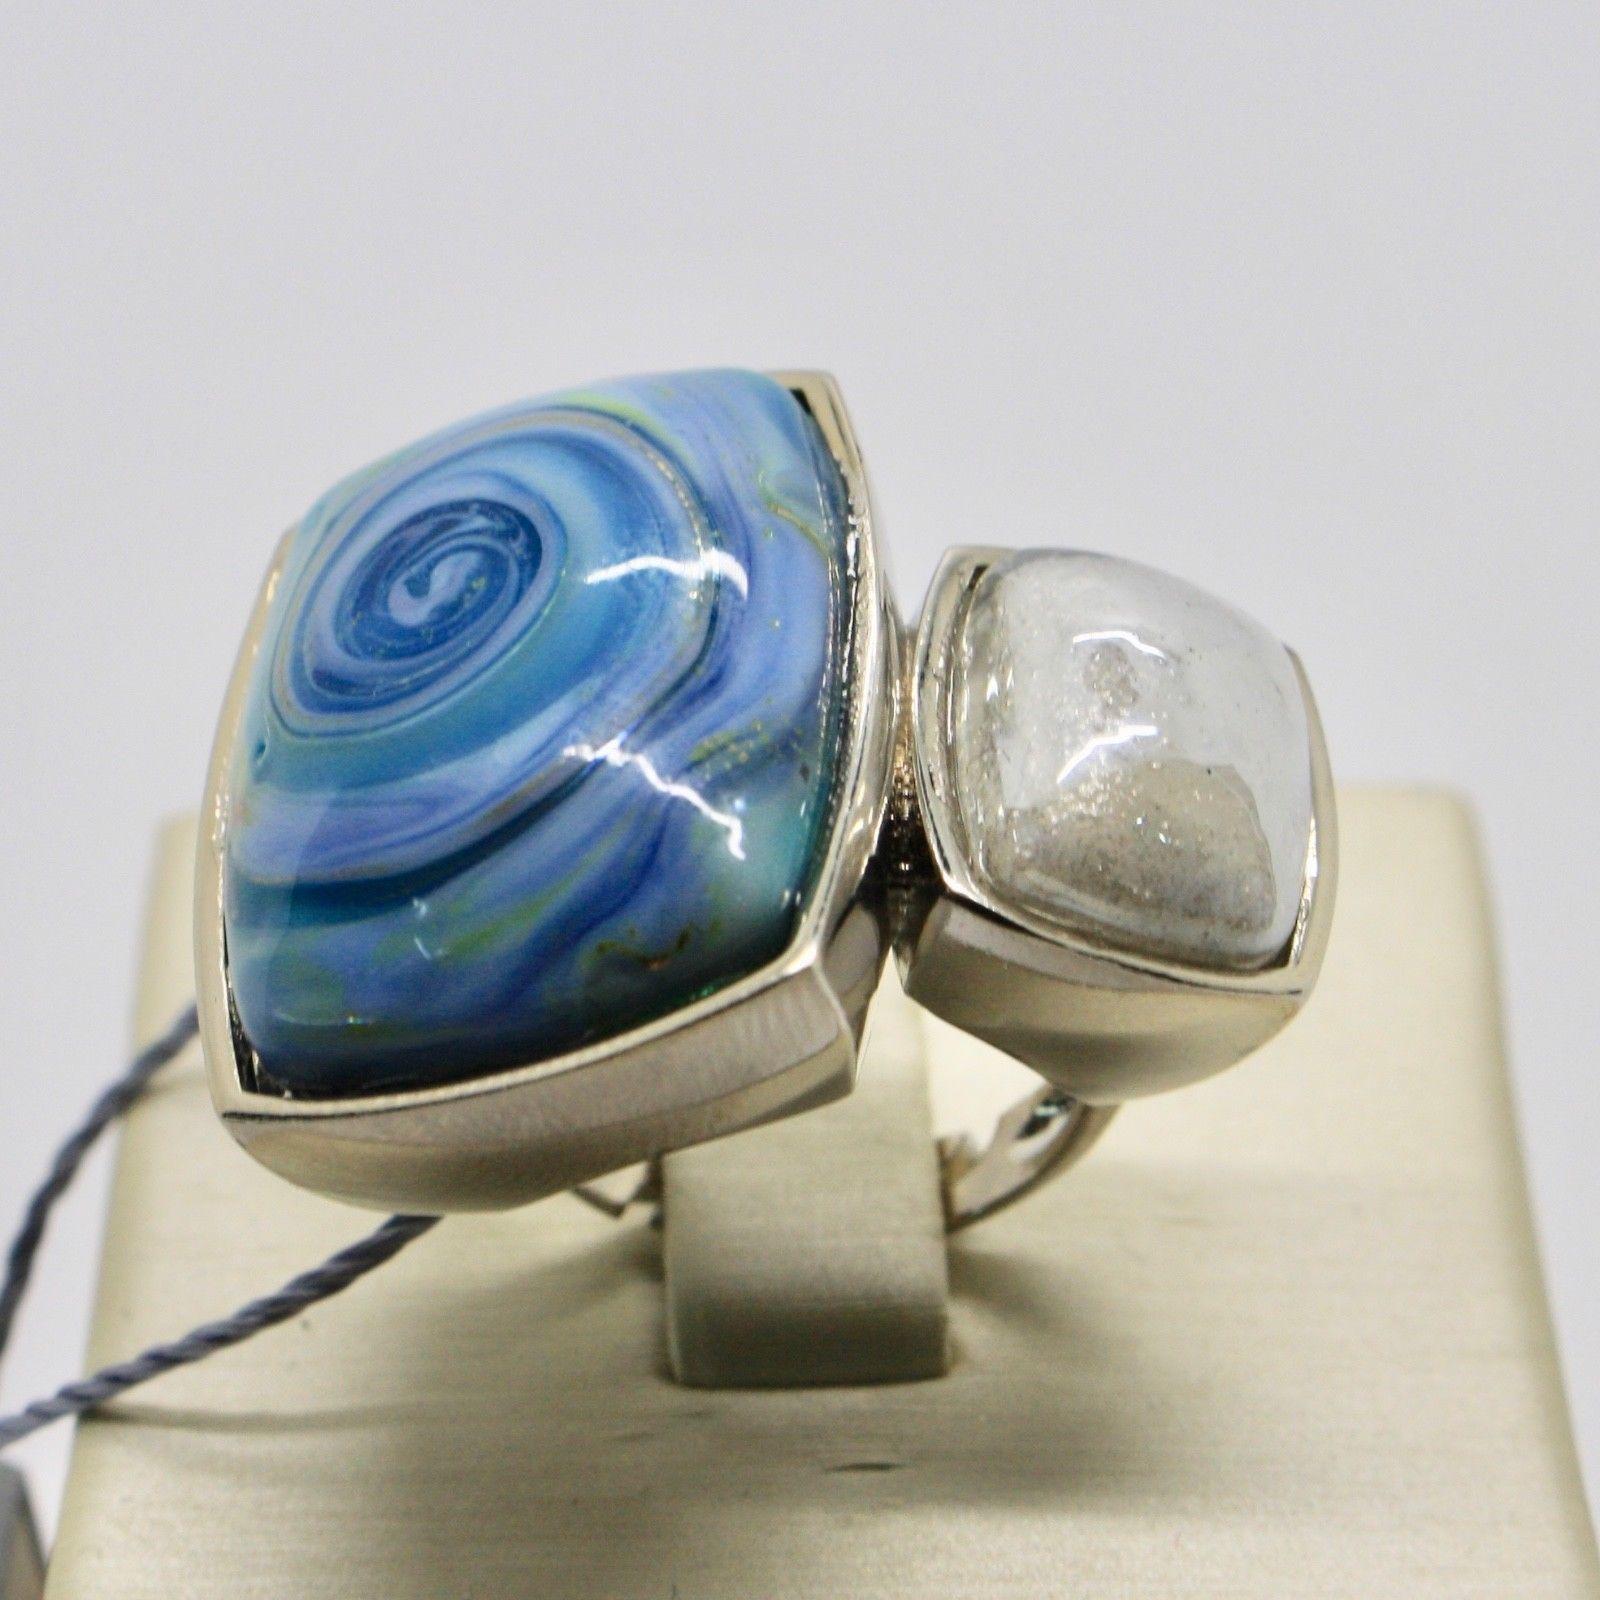 ANTICA MURRINA VENEZIA RING WITH MURANO GLASS BLUE WHITE BEIGE SILVER AN202A07